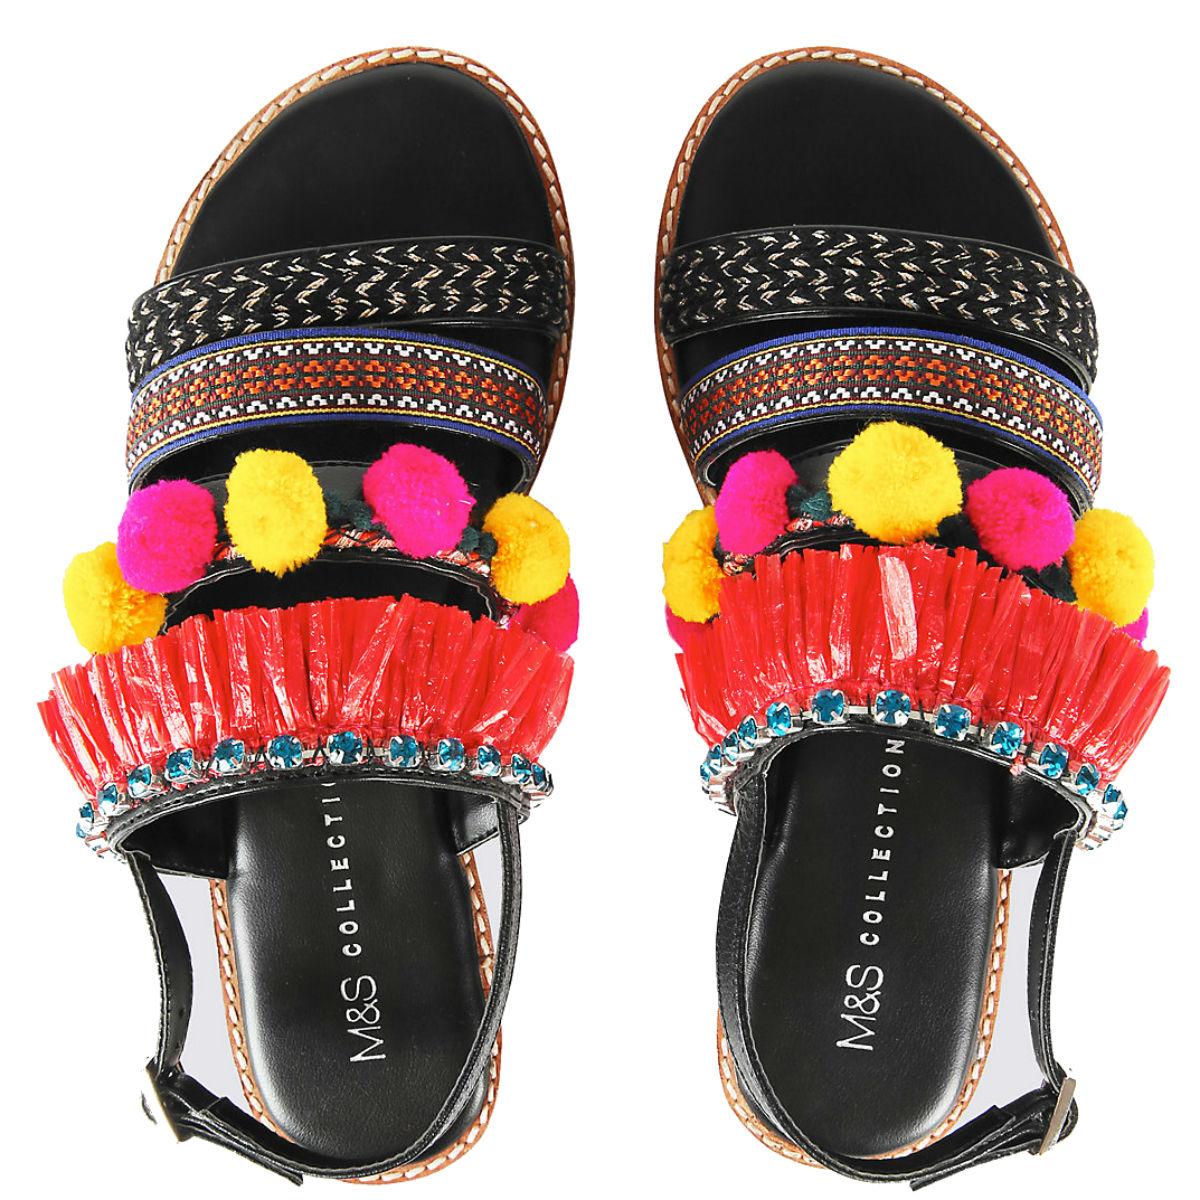 Multi strap pom pom sandals, £35, Marks & Spencer